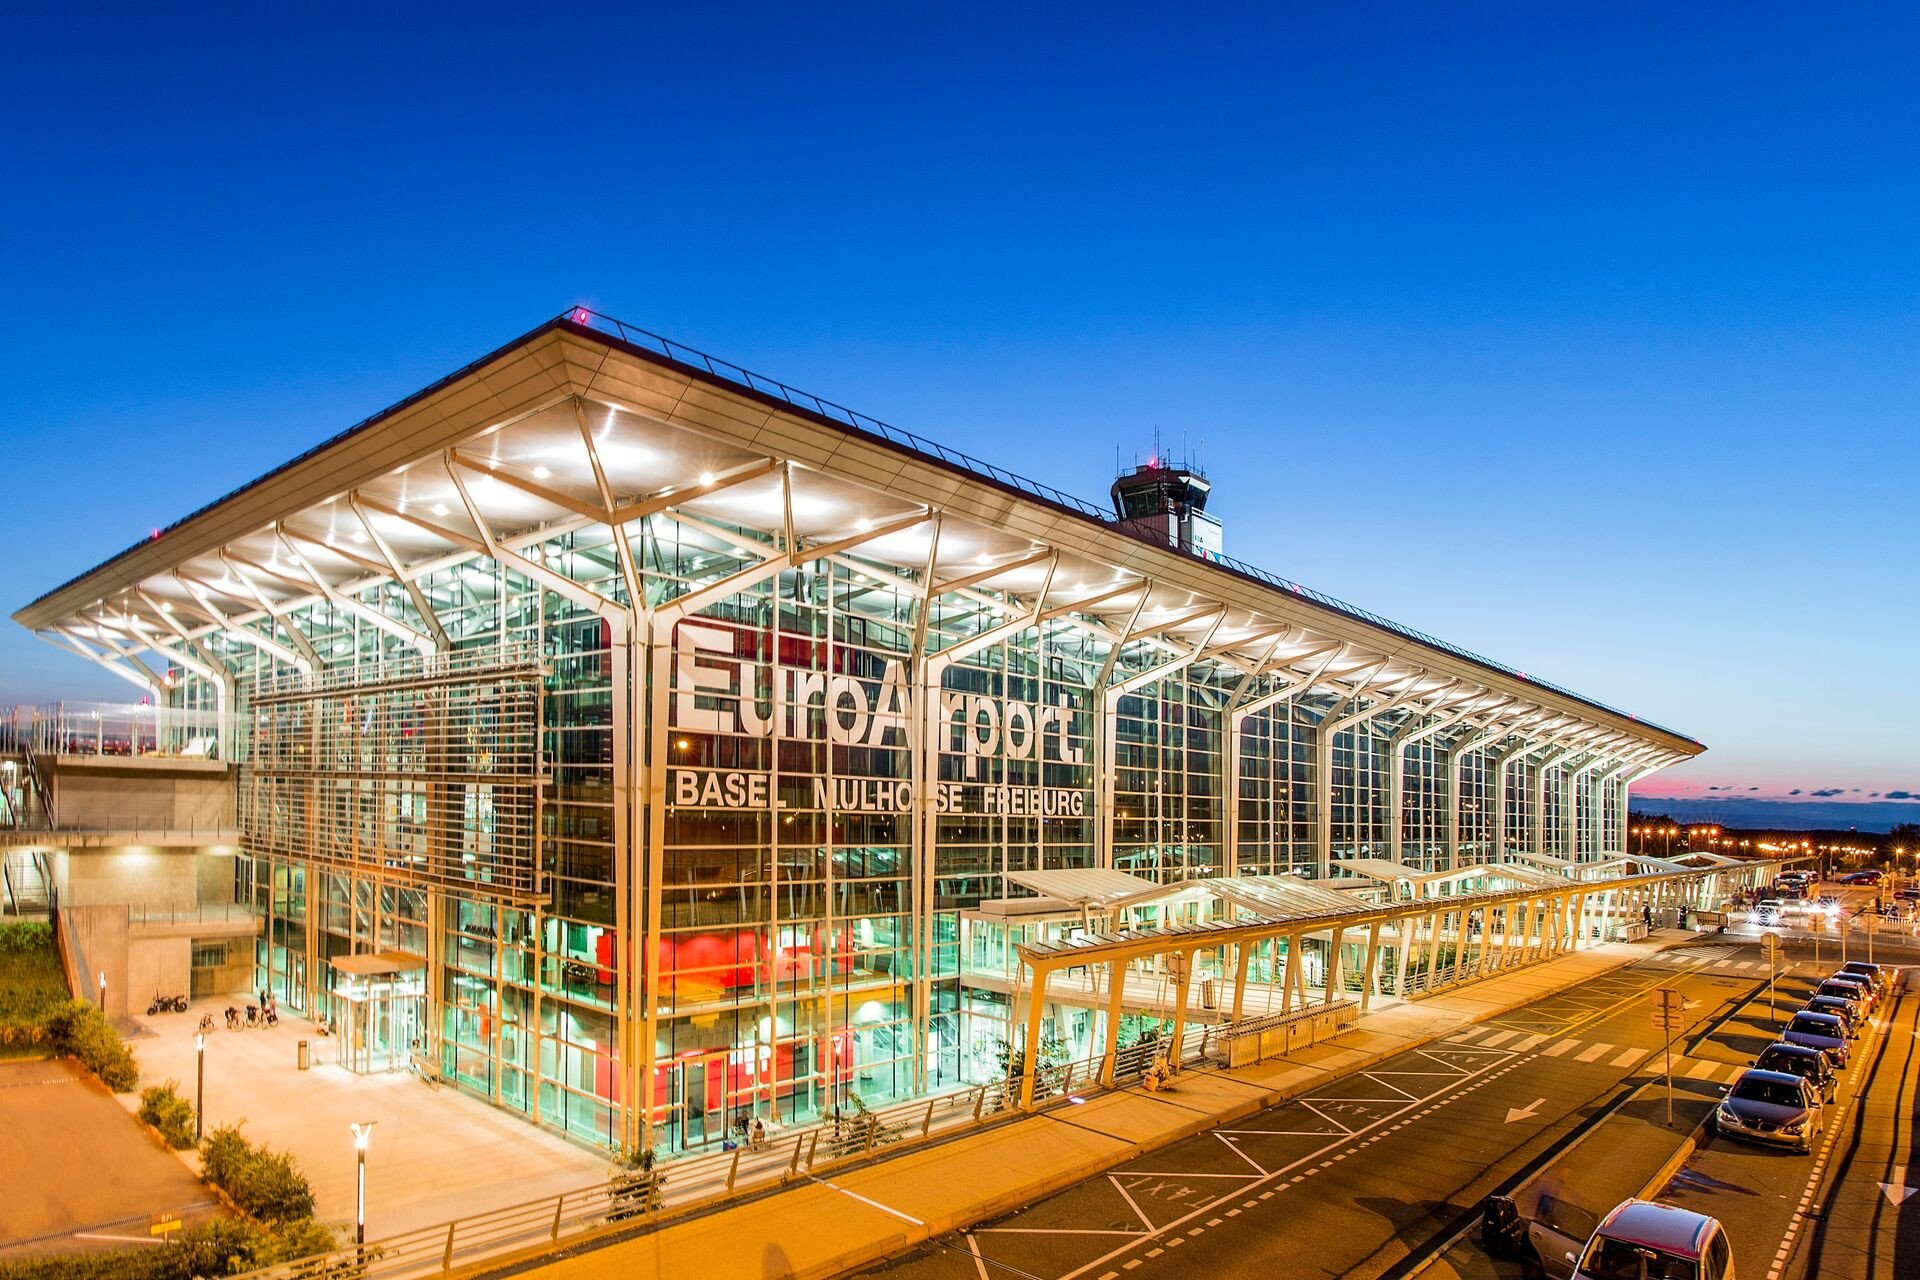 EAP Euroairport